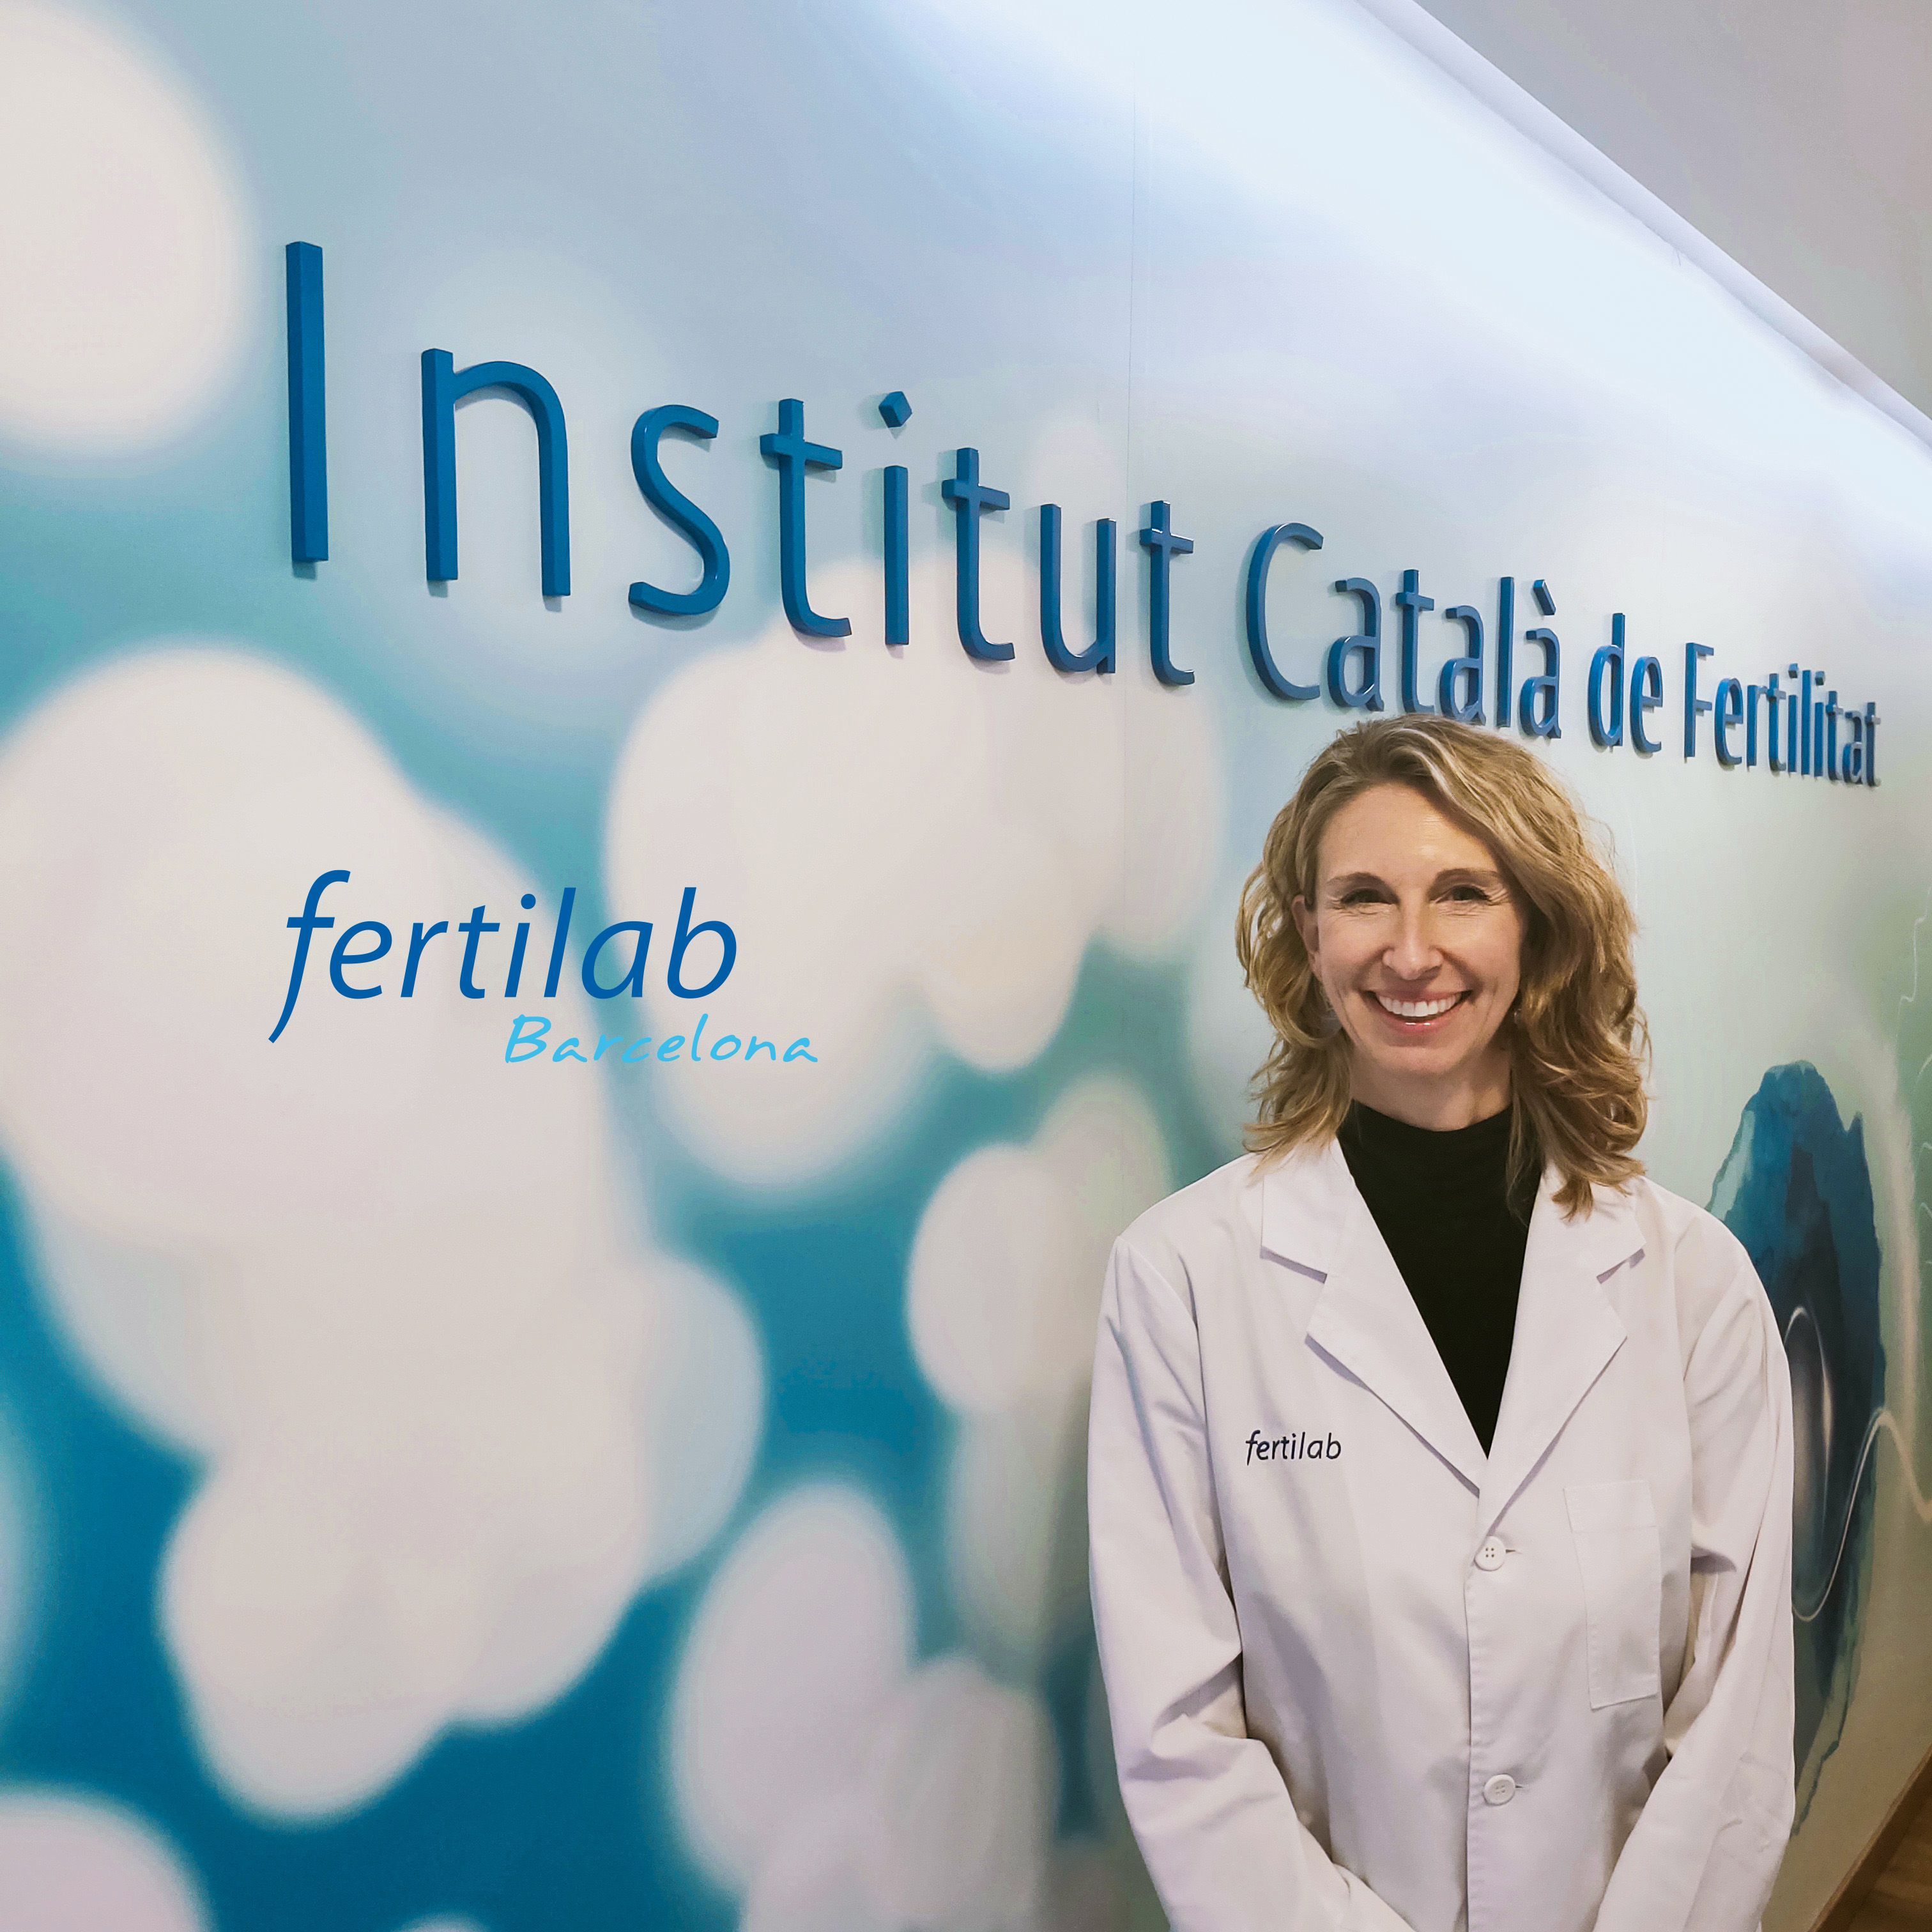 Foto de Dra. Federica Moffa in Fertilab Barcelona